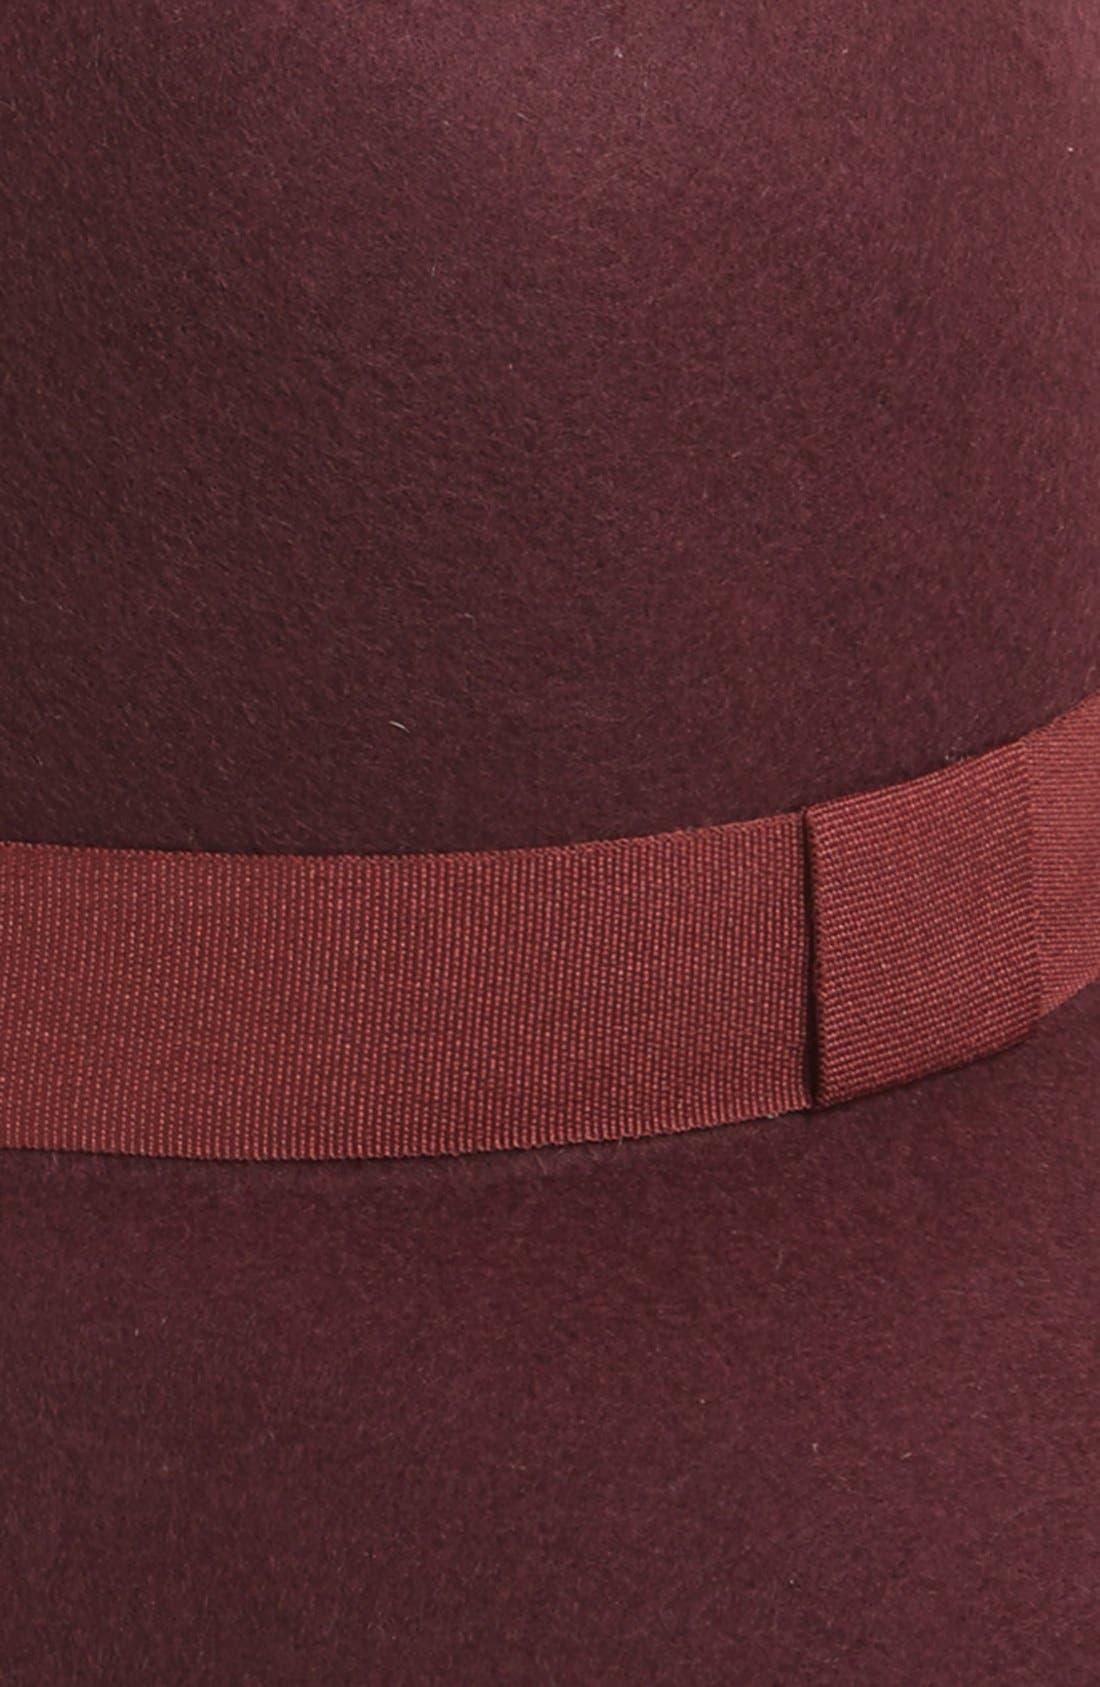 Alternate Image 2  - BP. Ribbon Trim Felt Floppy Hat